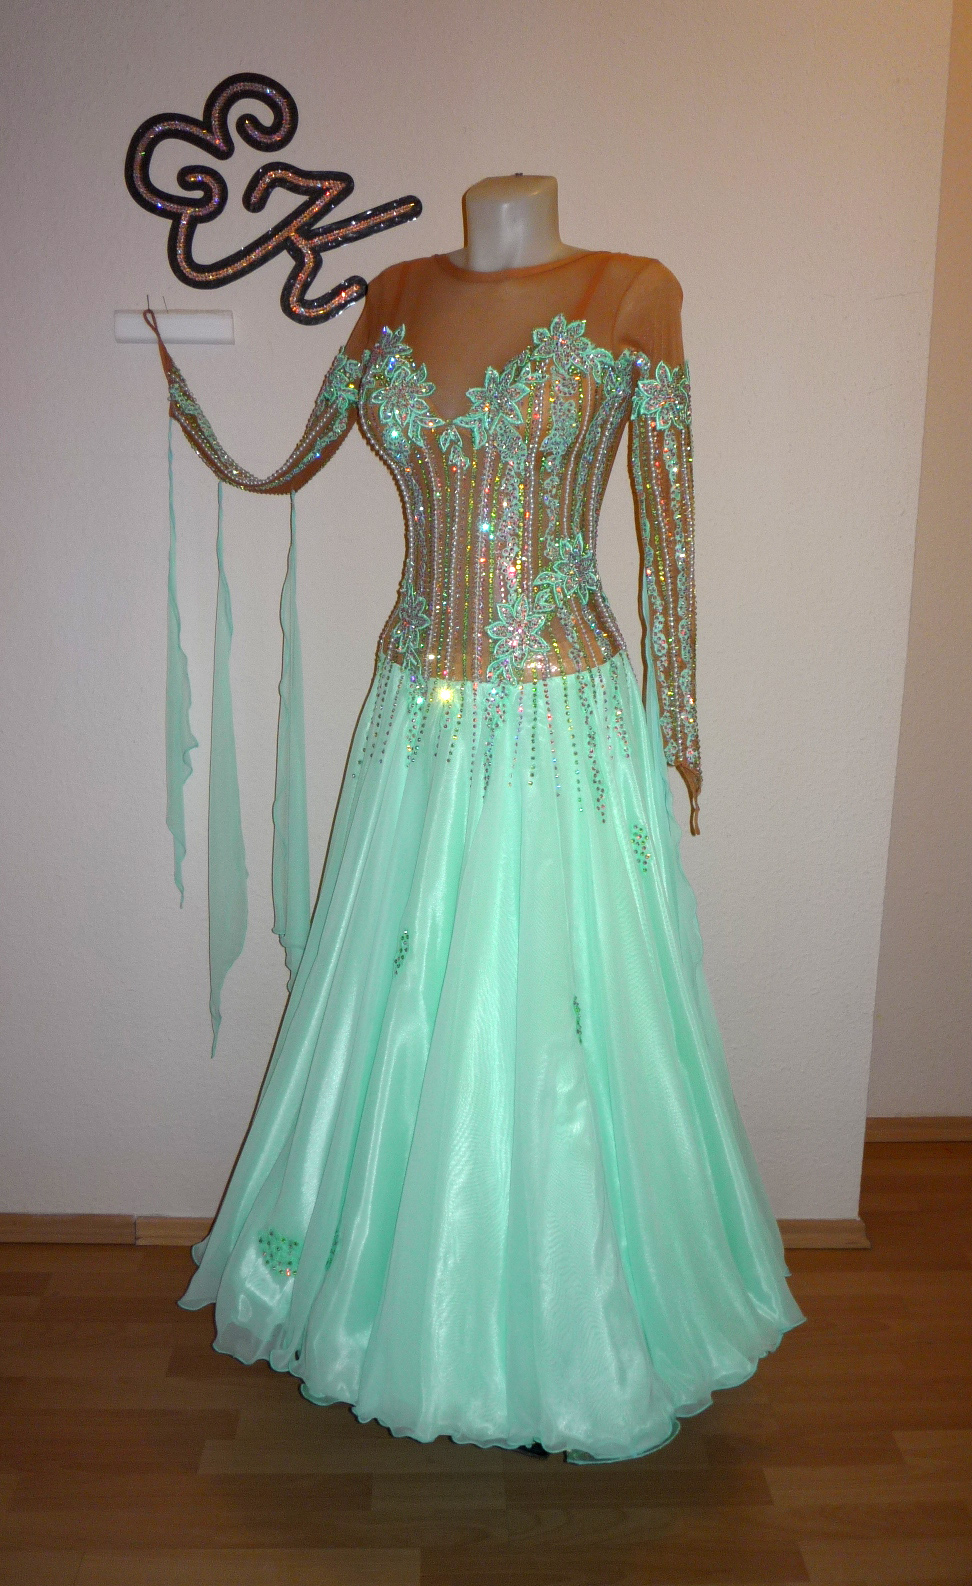 T067 Mint Green Flesh Standard Dance Costume For Sale